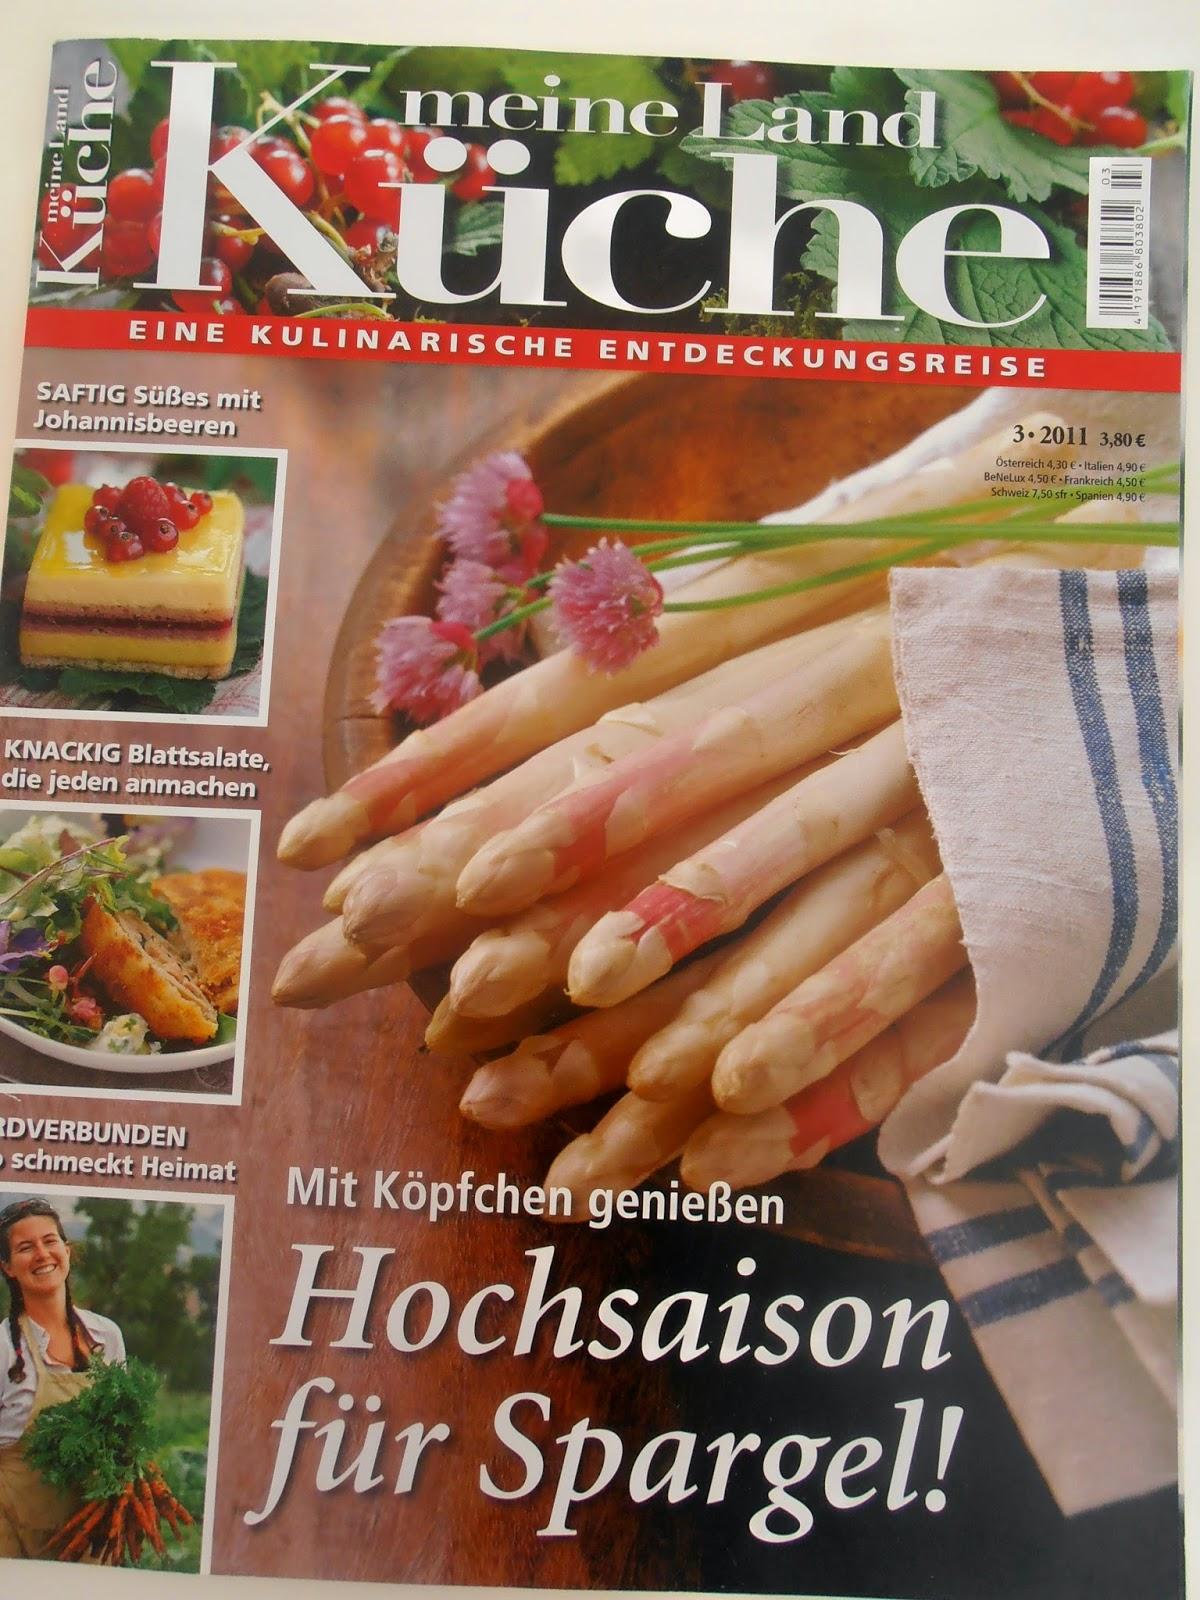 oktoberfrau flohmarkt